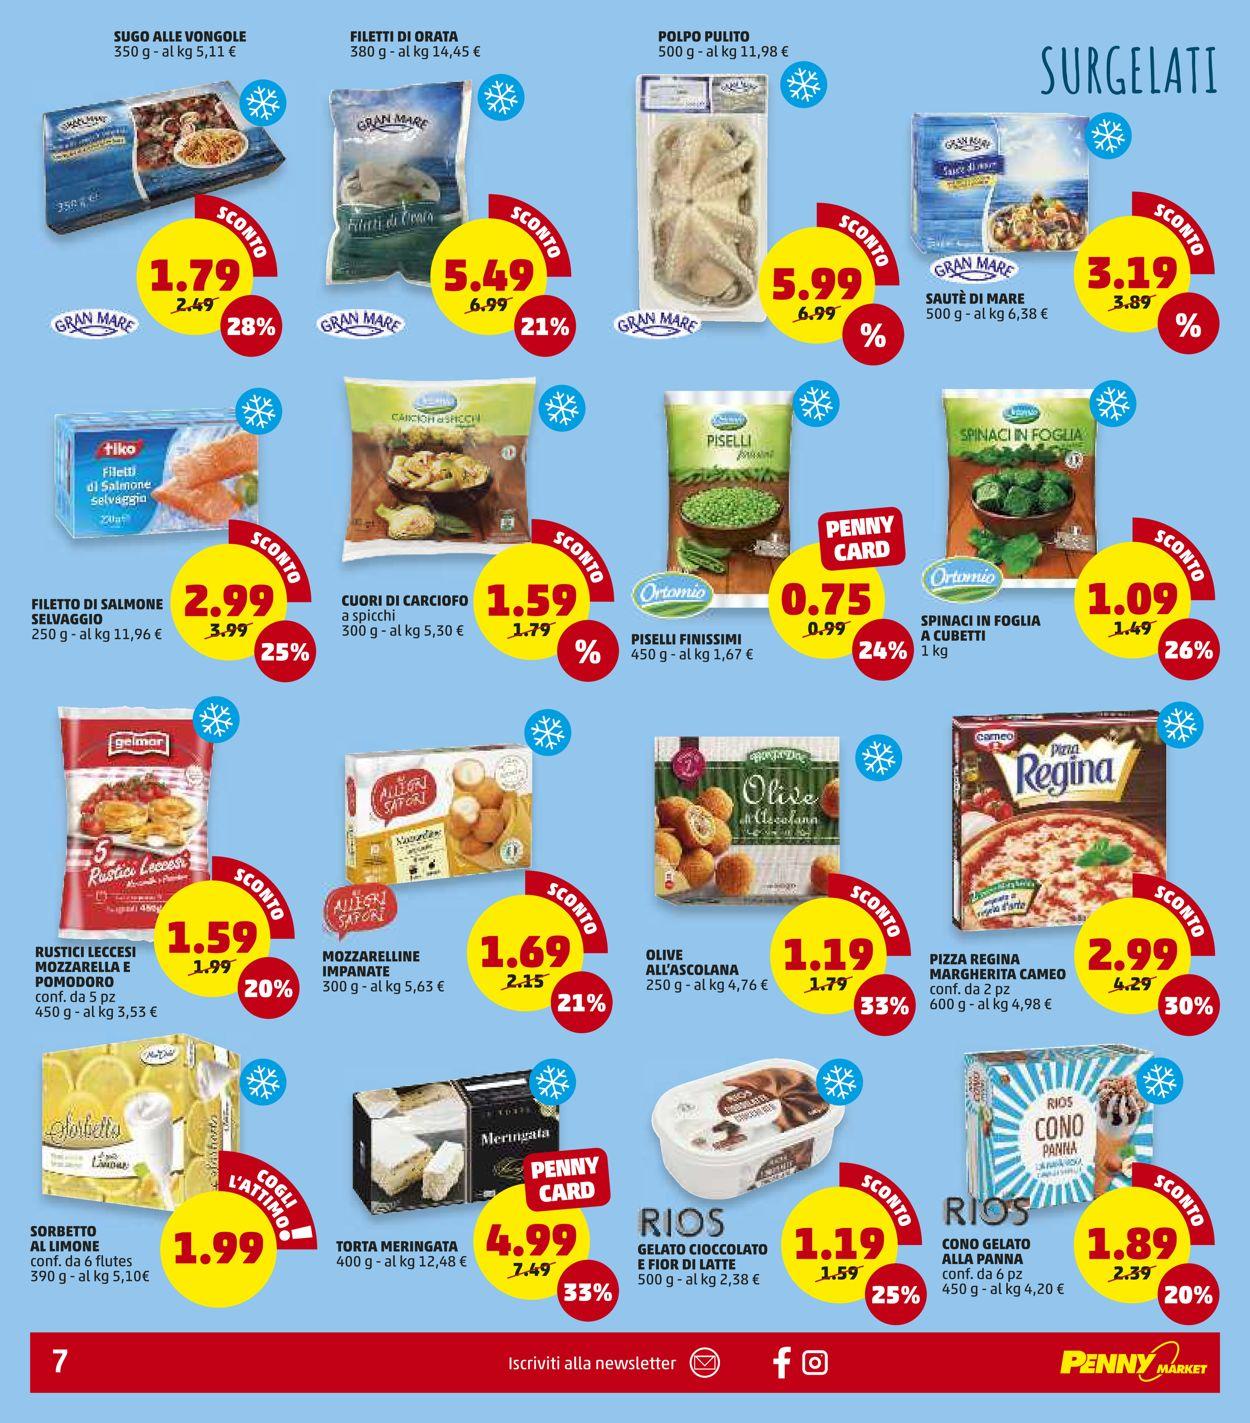 Volantino Penny Market - Offerte 02/04-13/04/2020 (Pagina 7)